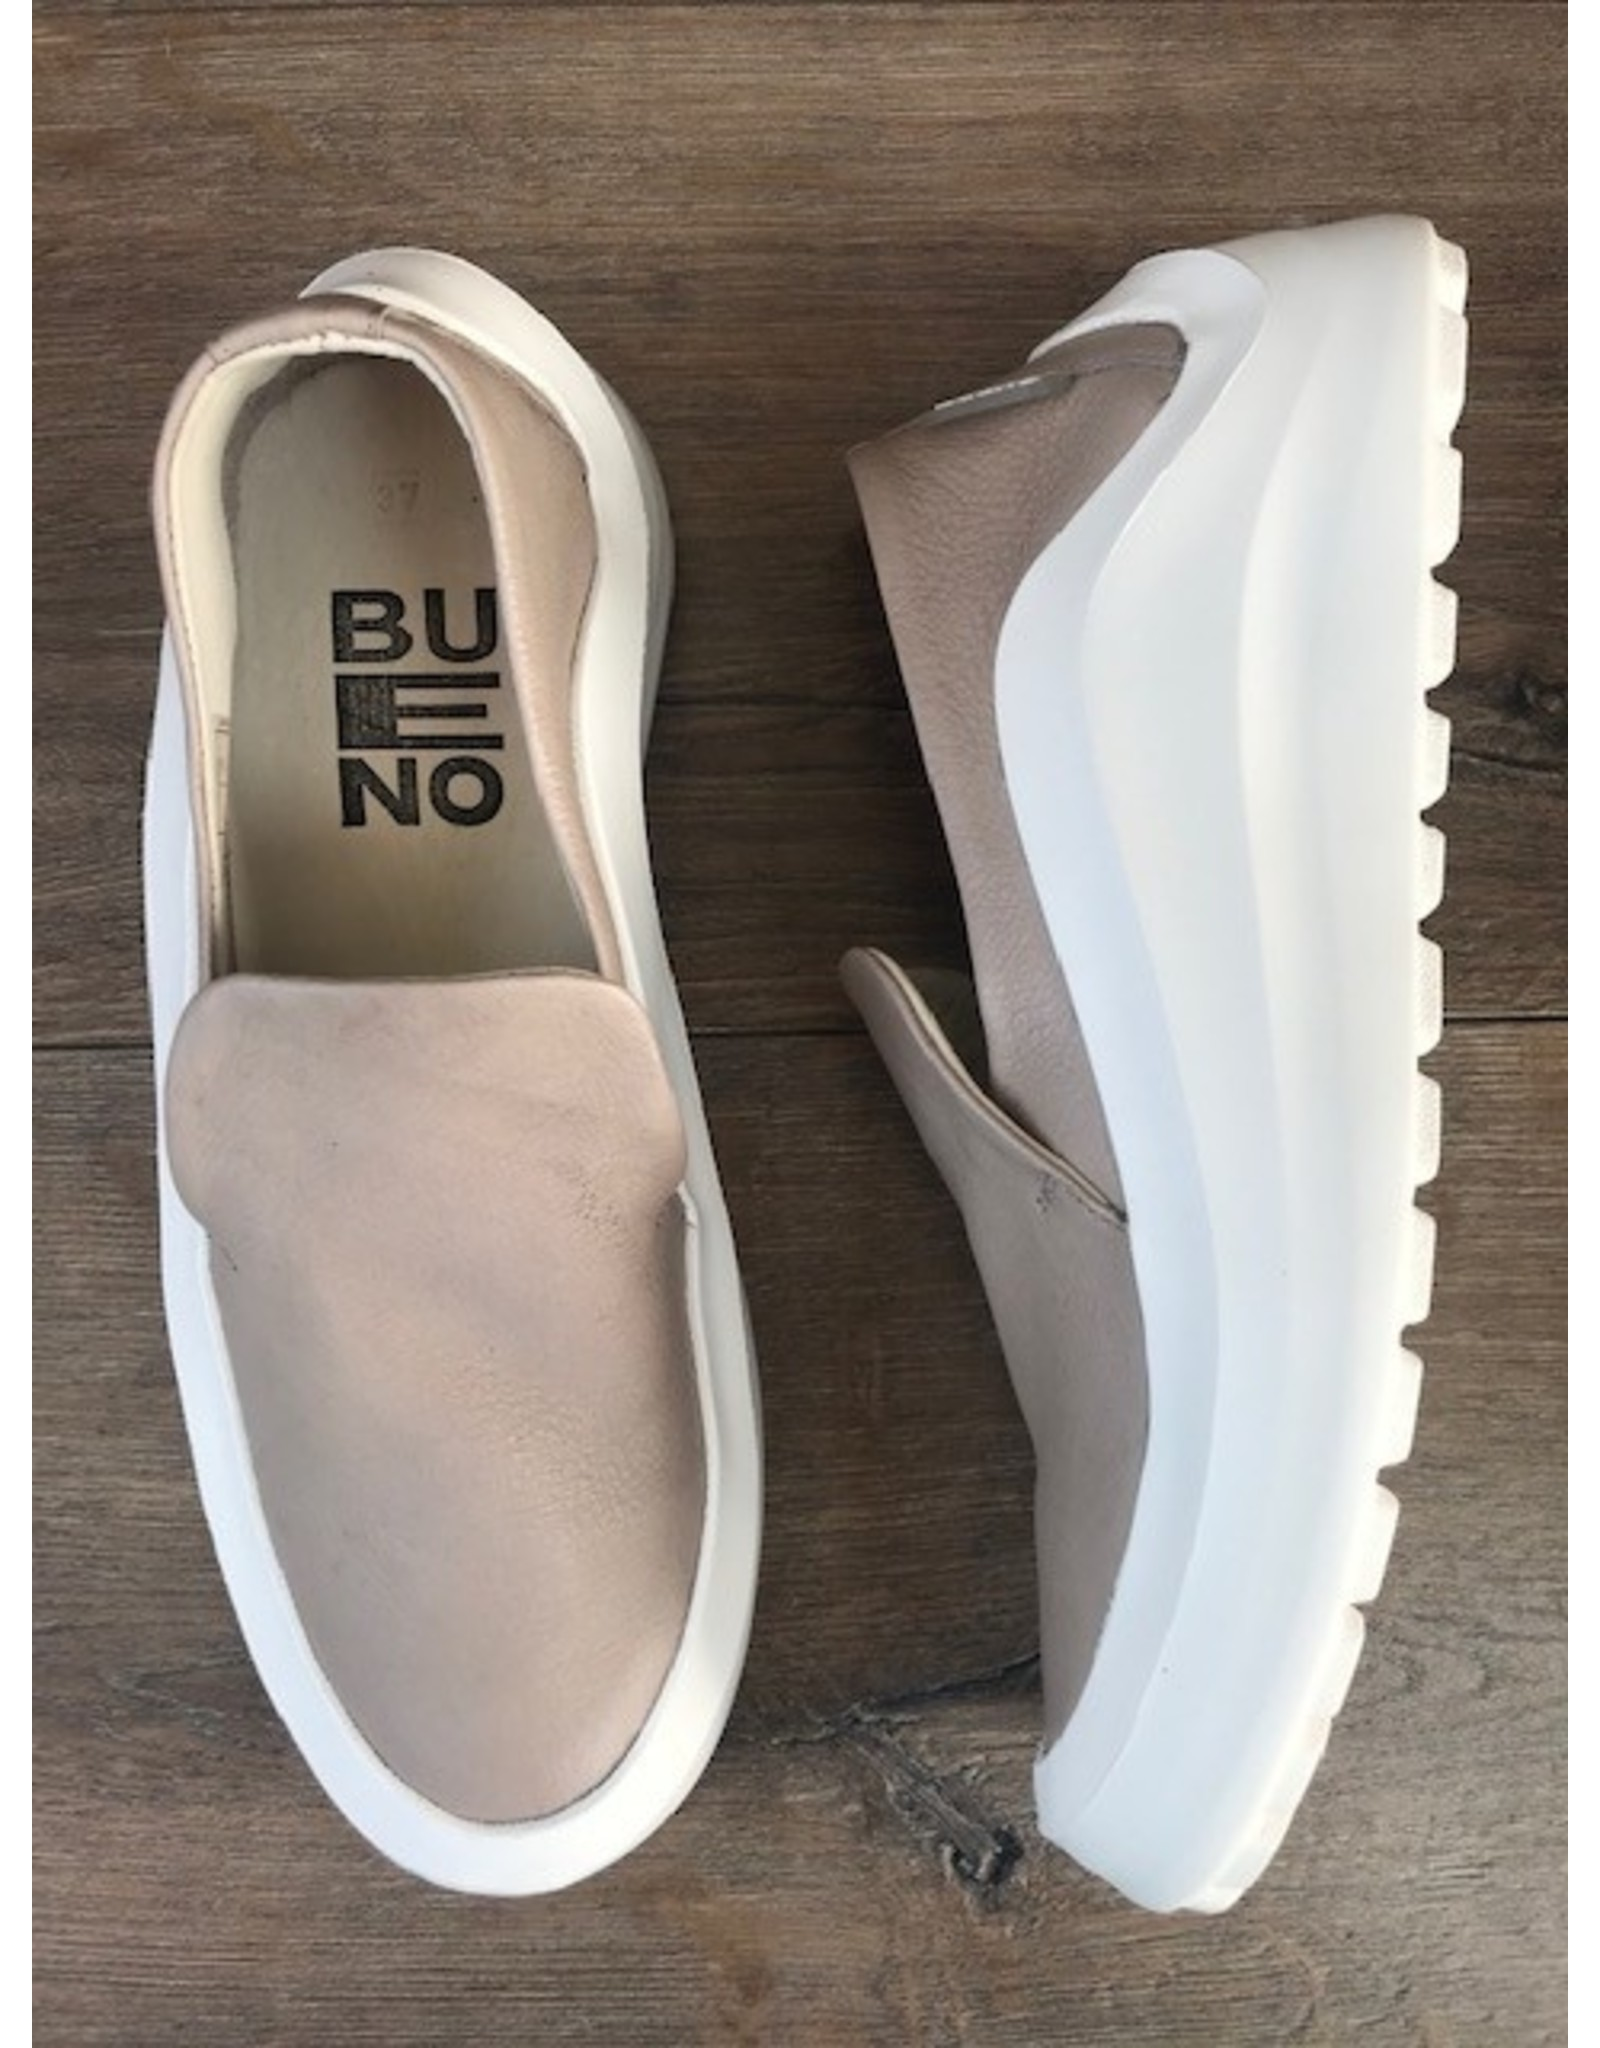 Bueno Bueno - Pali pull on sneaker (light grey)